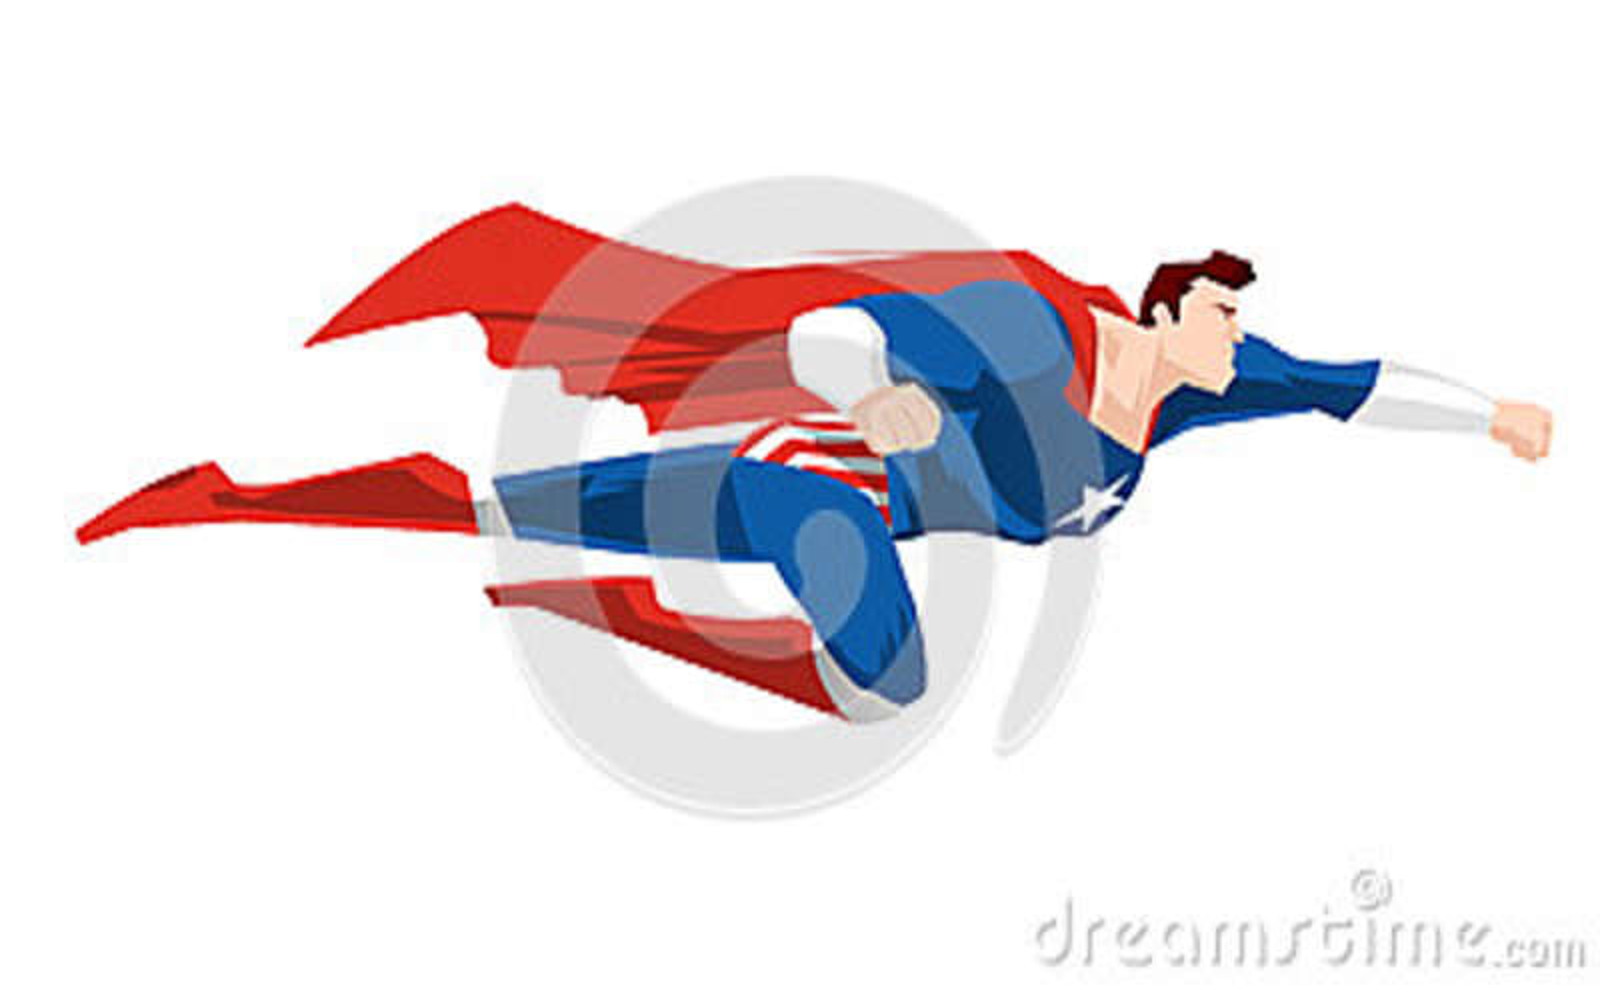 Cartoon Super Hero Flying Stock Illustration Illustration Of Human 86665328